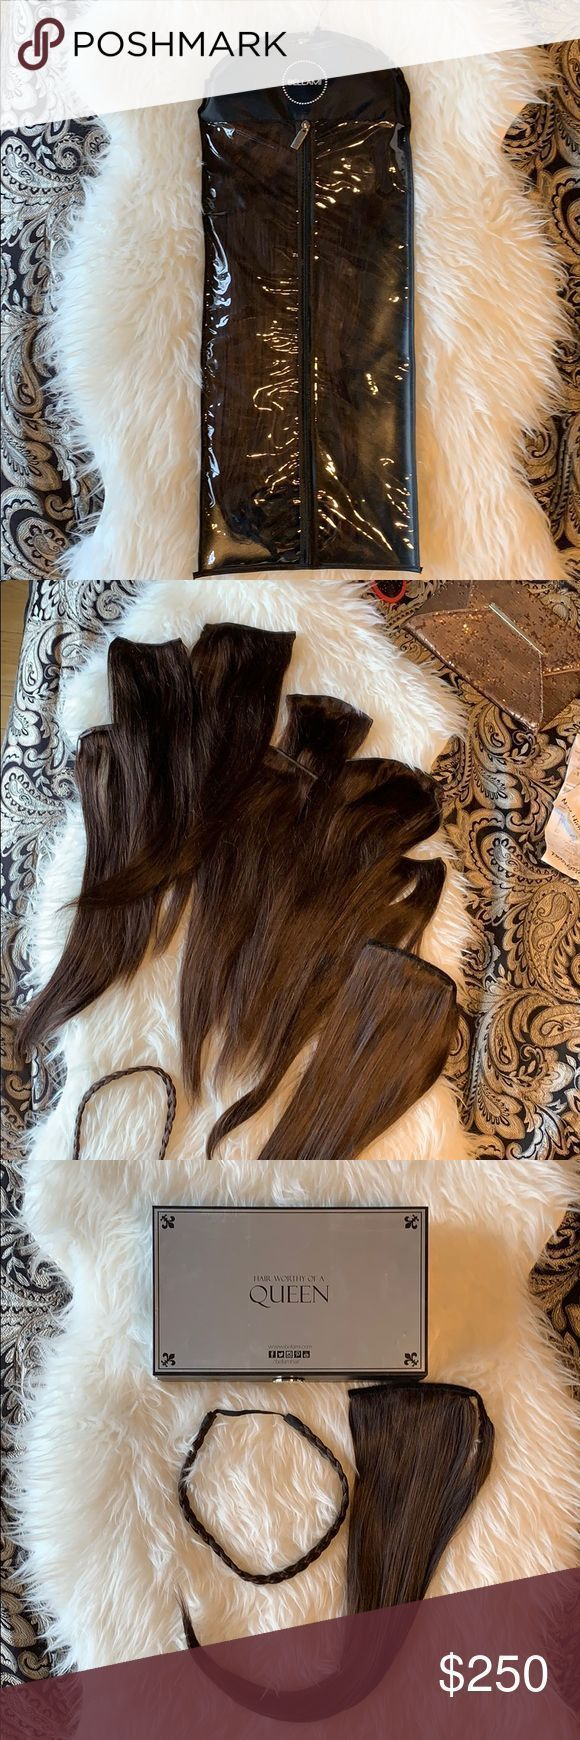 Bellami Hair Extensions Khalessi Dark brown 7 weft clip in hair extensions 280